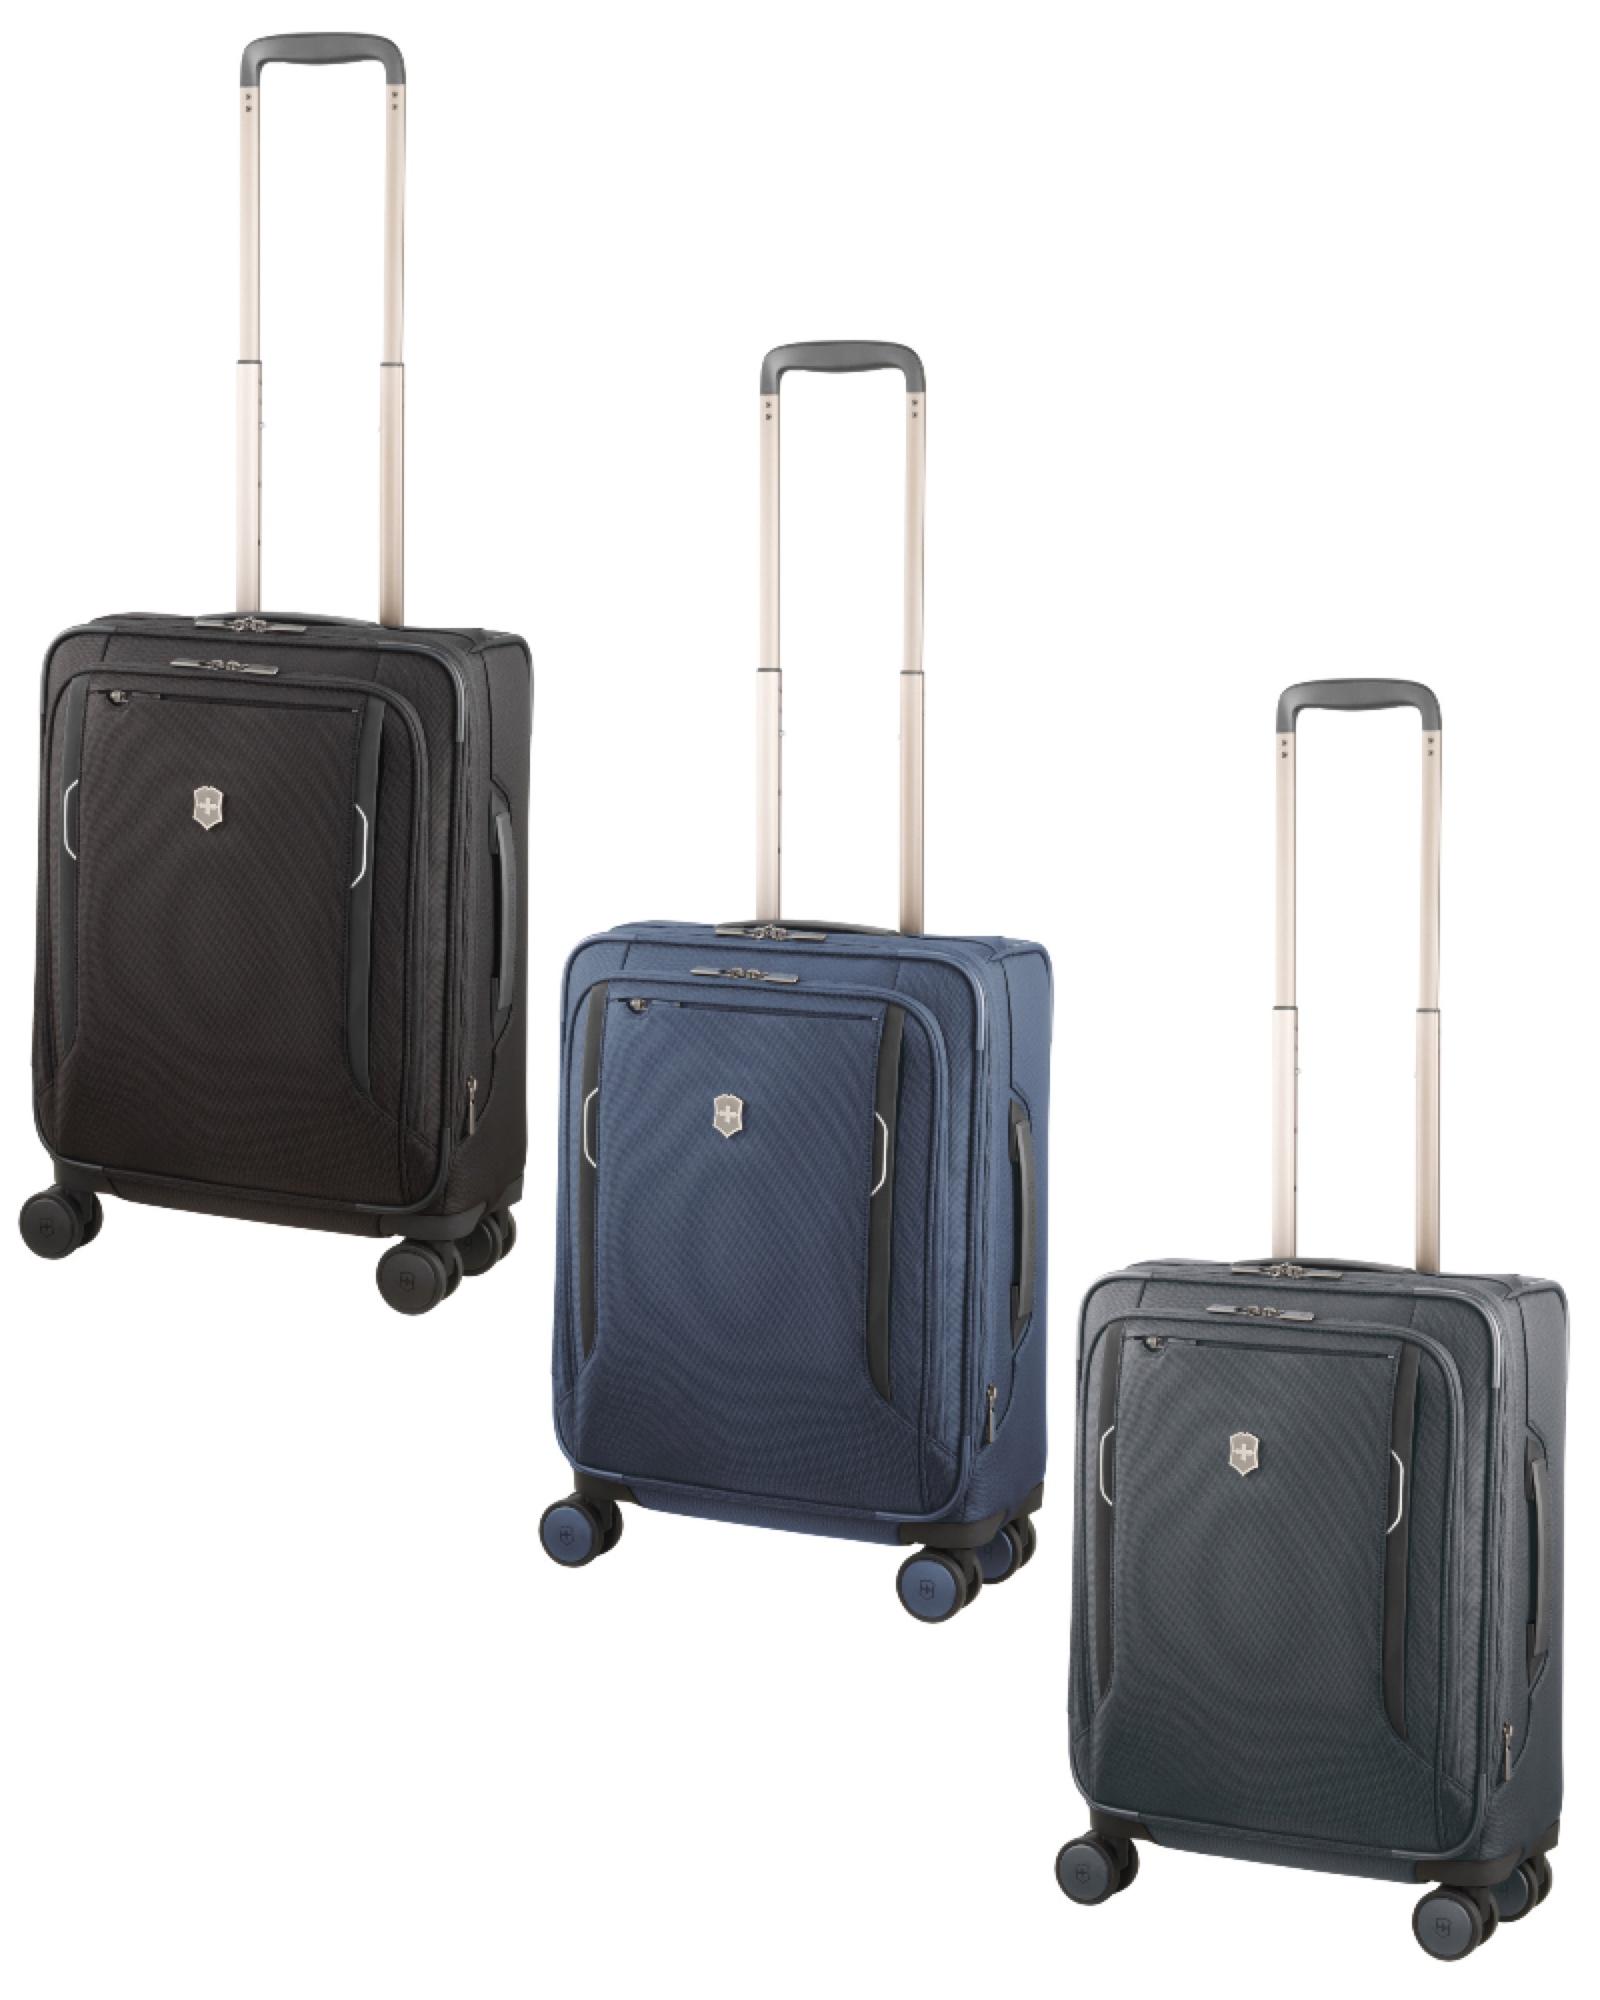 3f77ef26ec22 Victorinox Werks Traveller 6.0 - 55cm Dual-Caster Expandable Softside  Global Carry-on